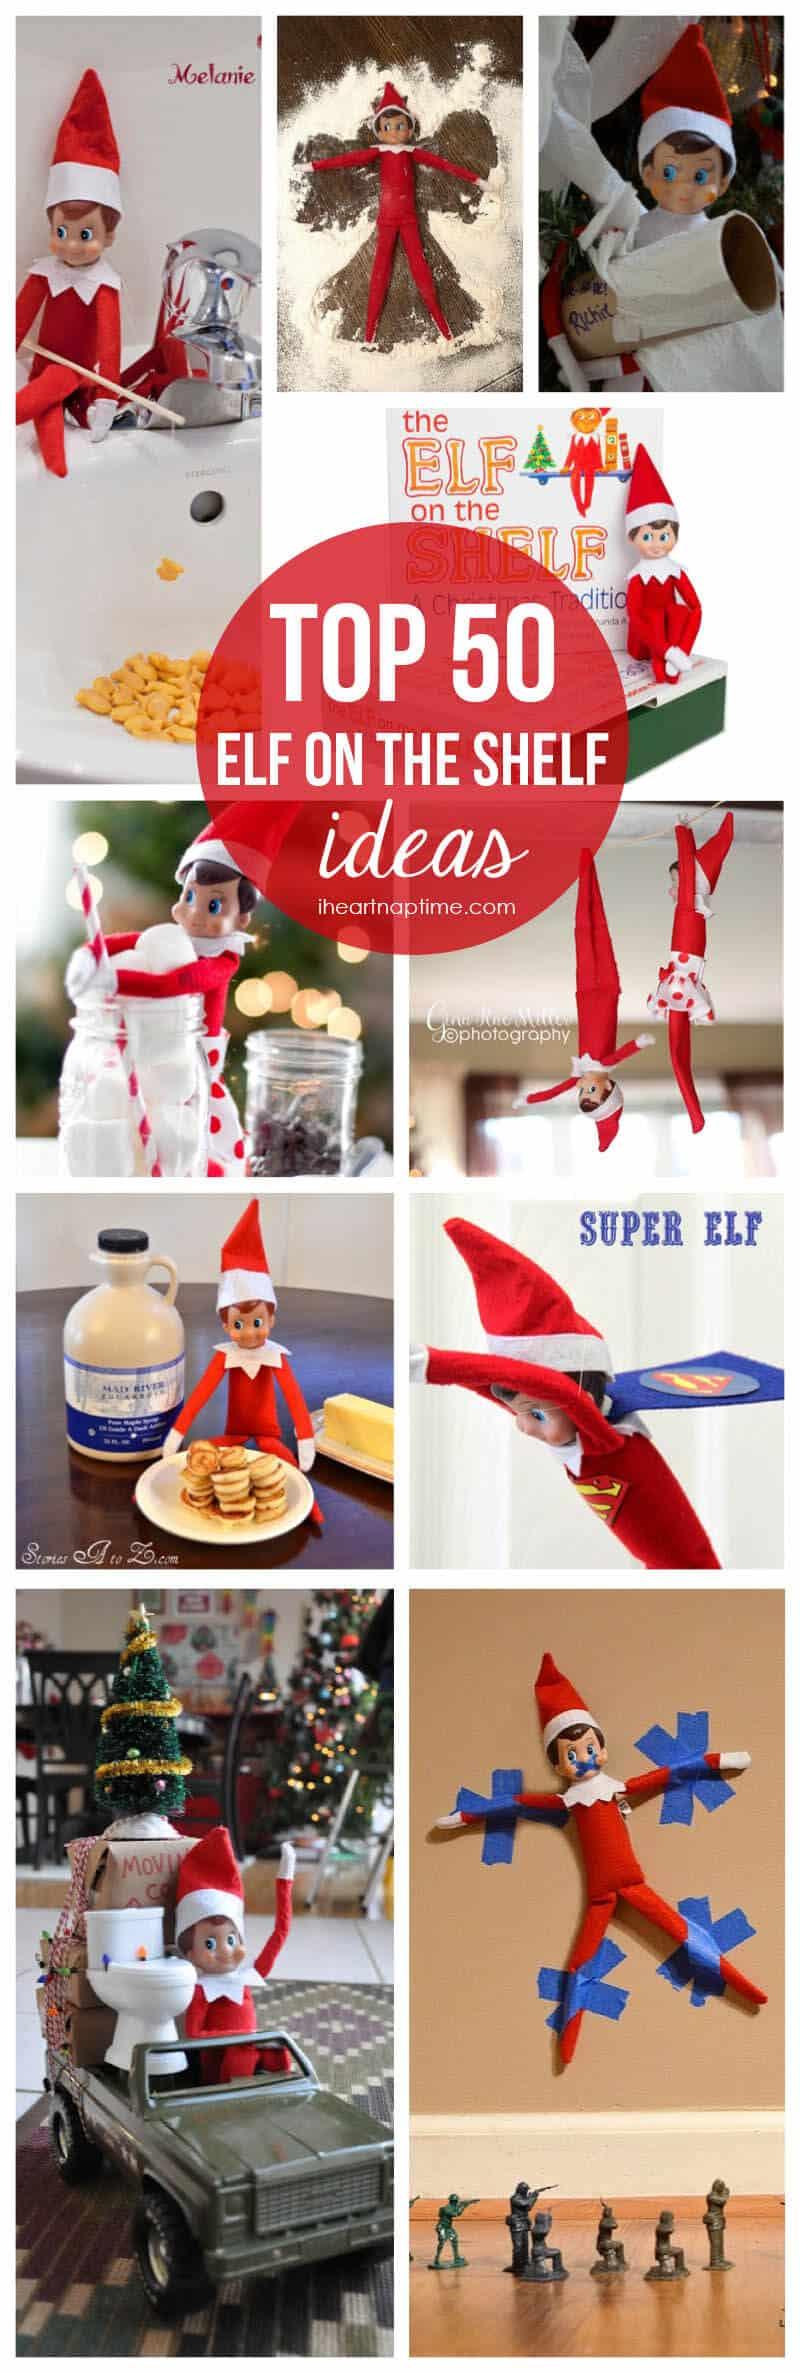 Top 50 elf on the shelf ideas on iheartnaptime com